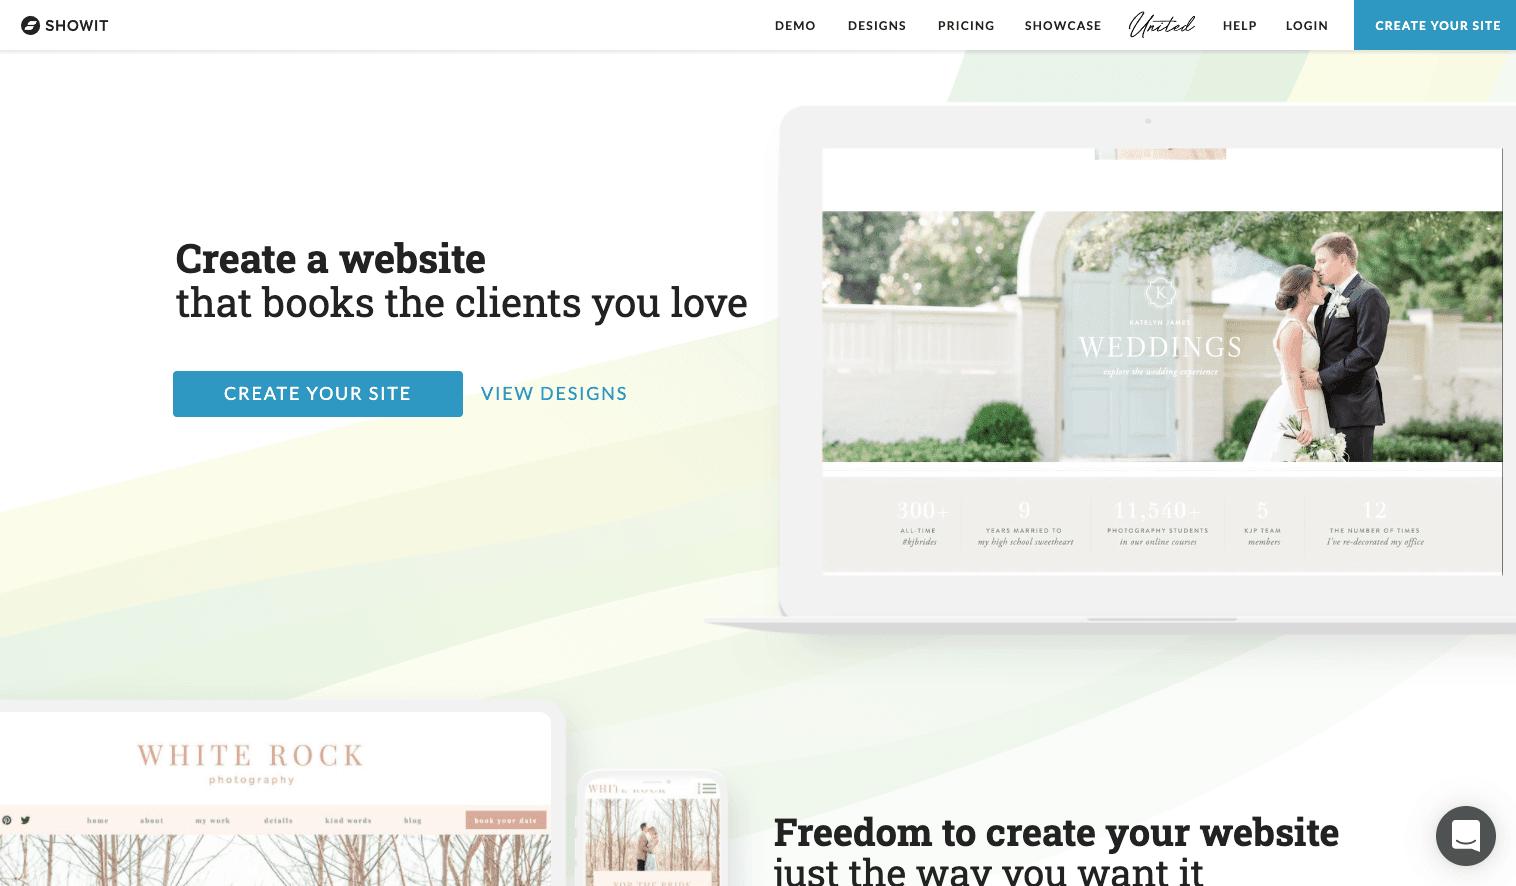 Screenshot of Showit homepage